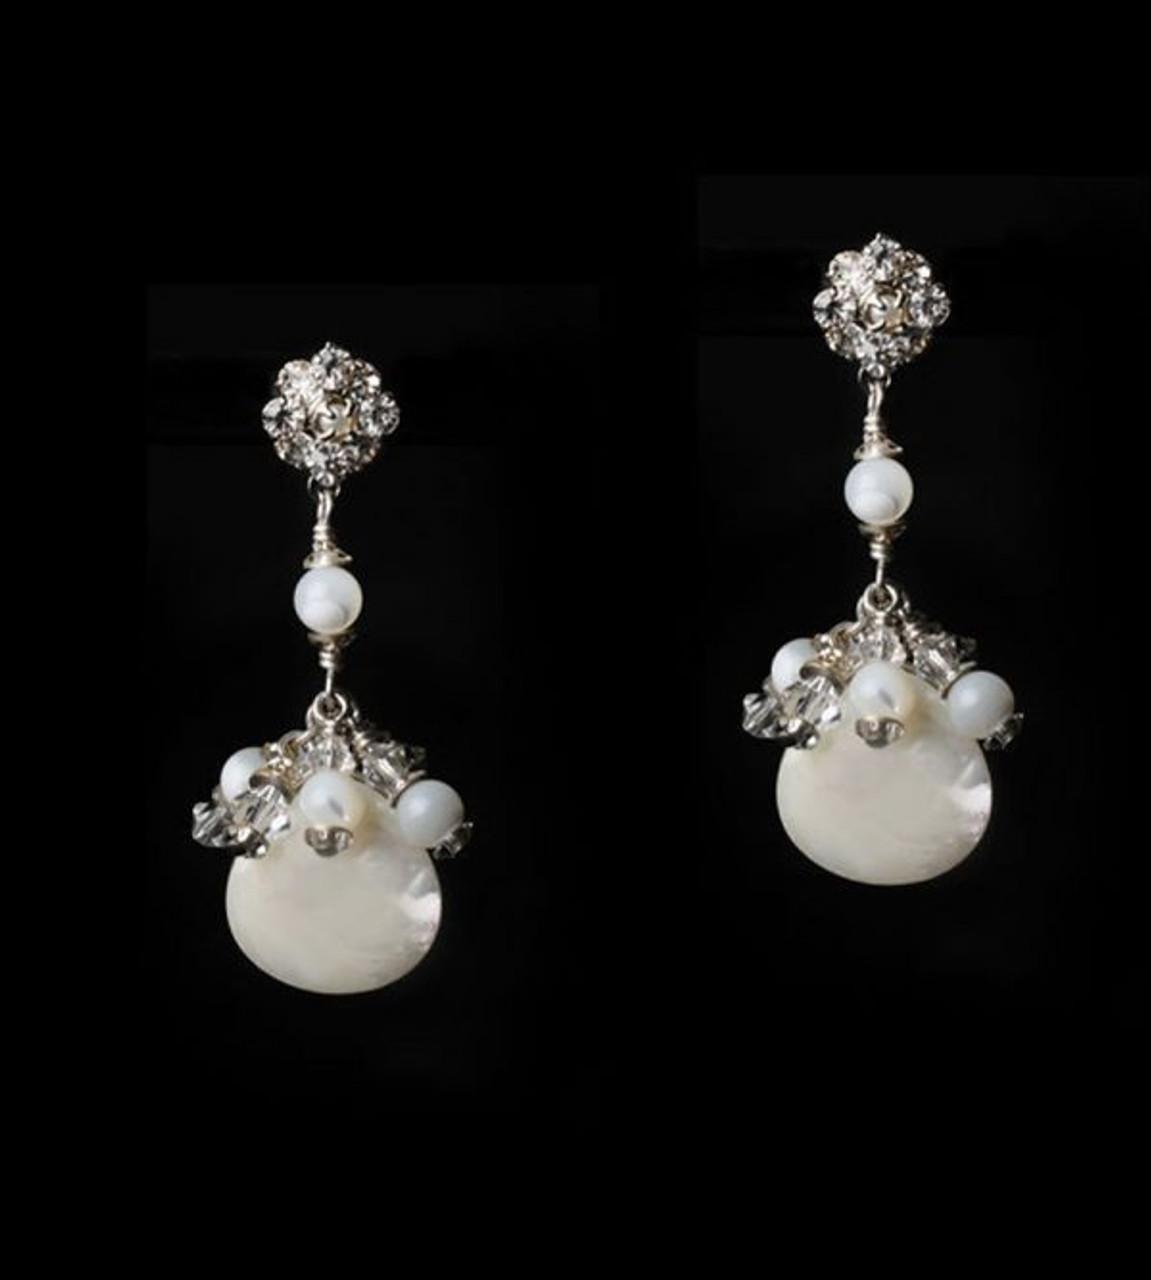 Erica Koesler Earring - Style J-9463